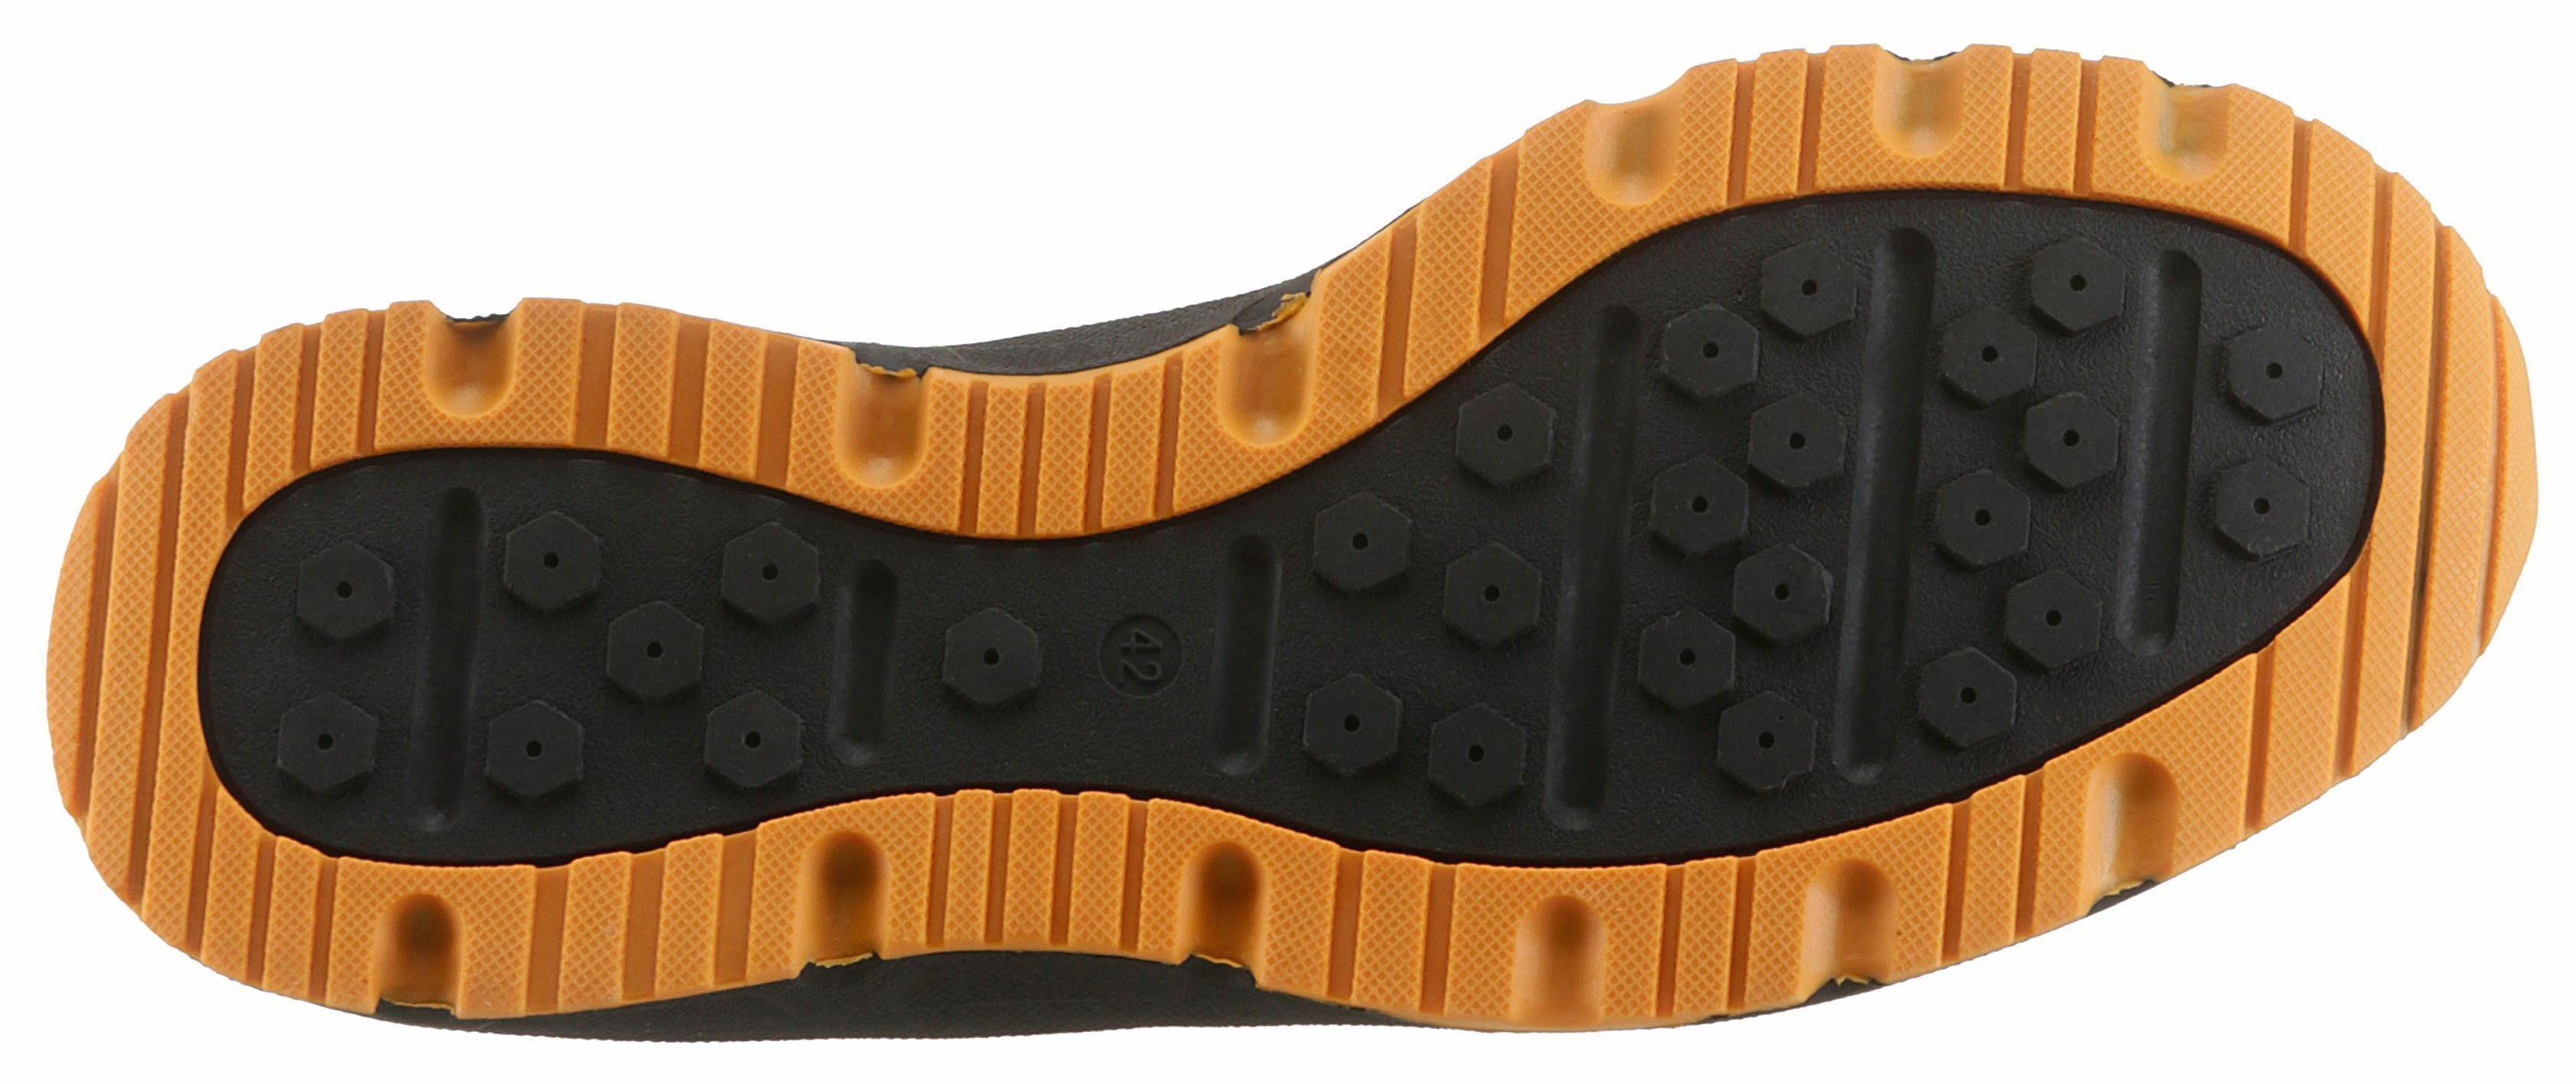 PETROLIO Clog, mit herausnehmbarer Innensohle  navy-orange